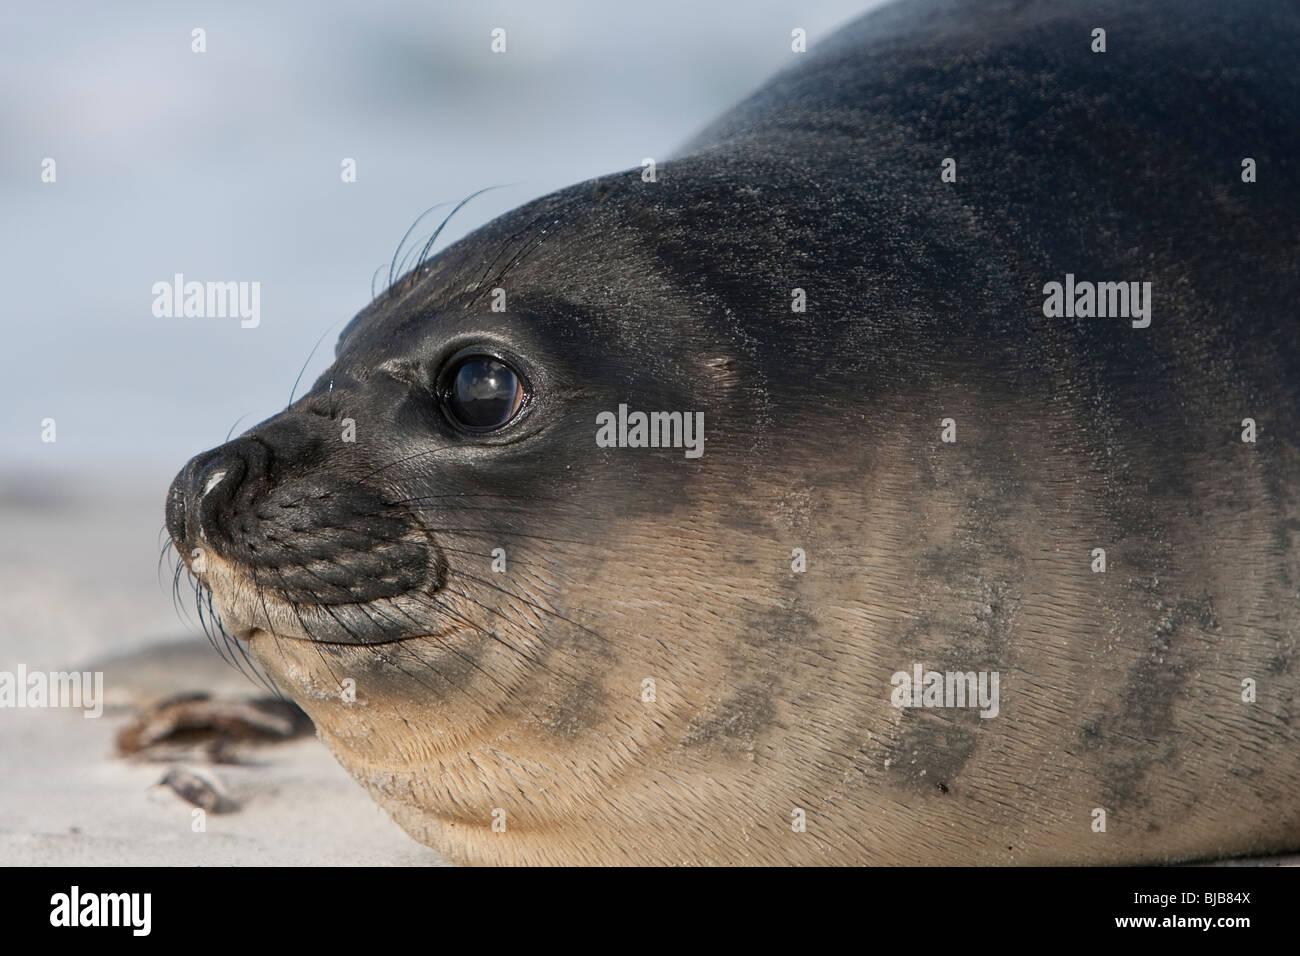 Southern Elephant Seal Mirounga leonina Südlicher See-Elefant Sea Lion Island Falkland Islands pup Stock Photo